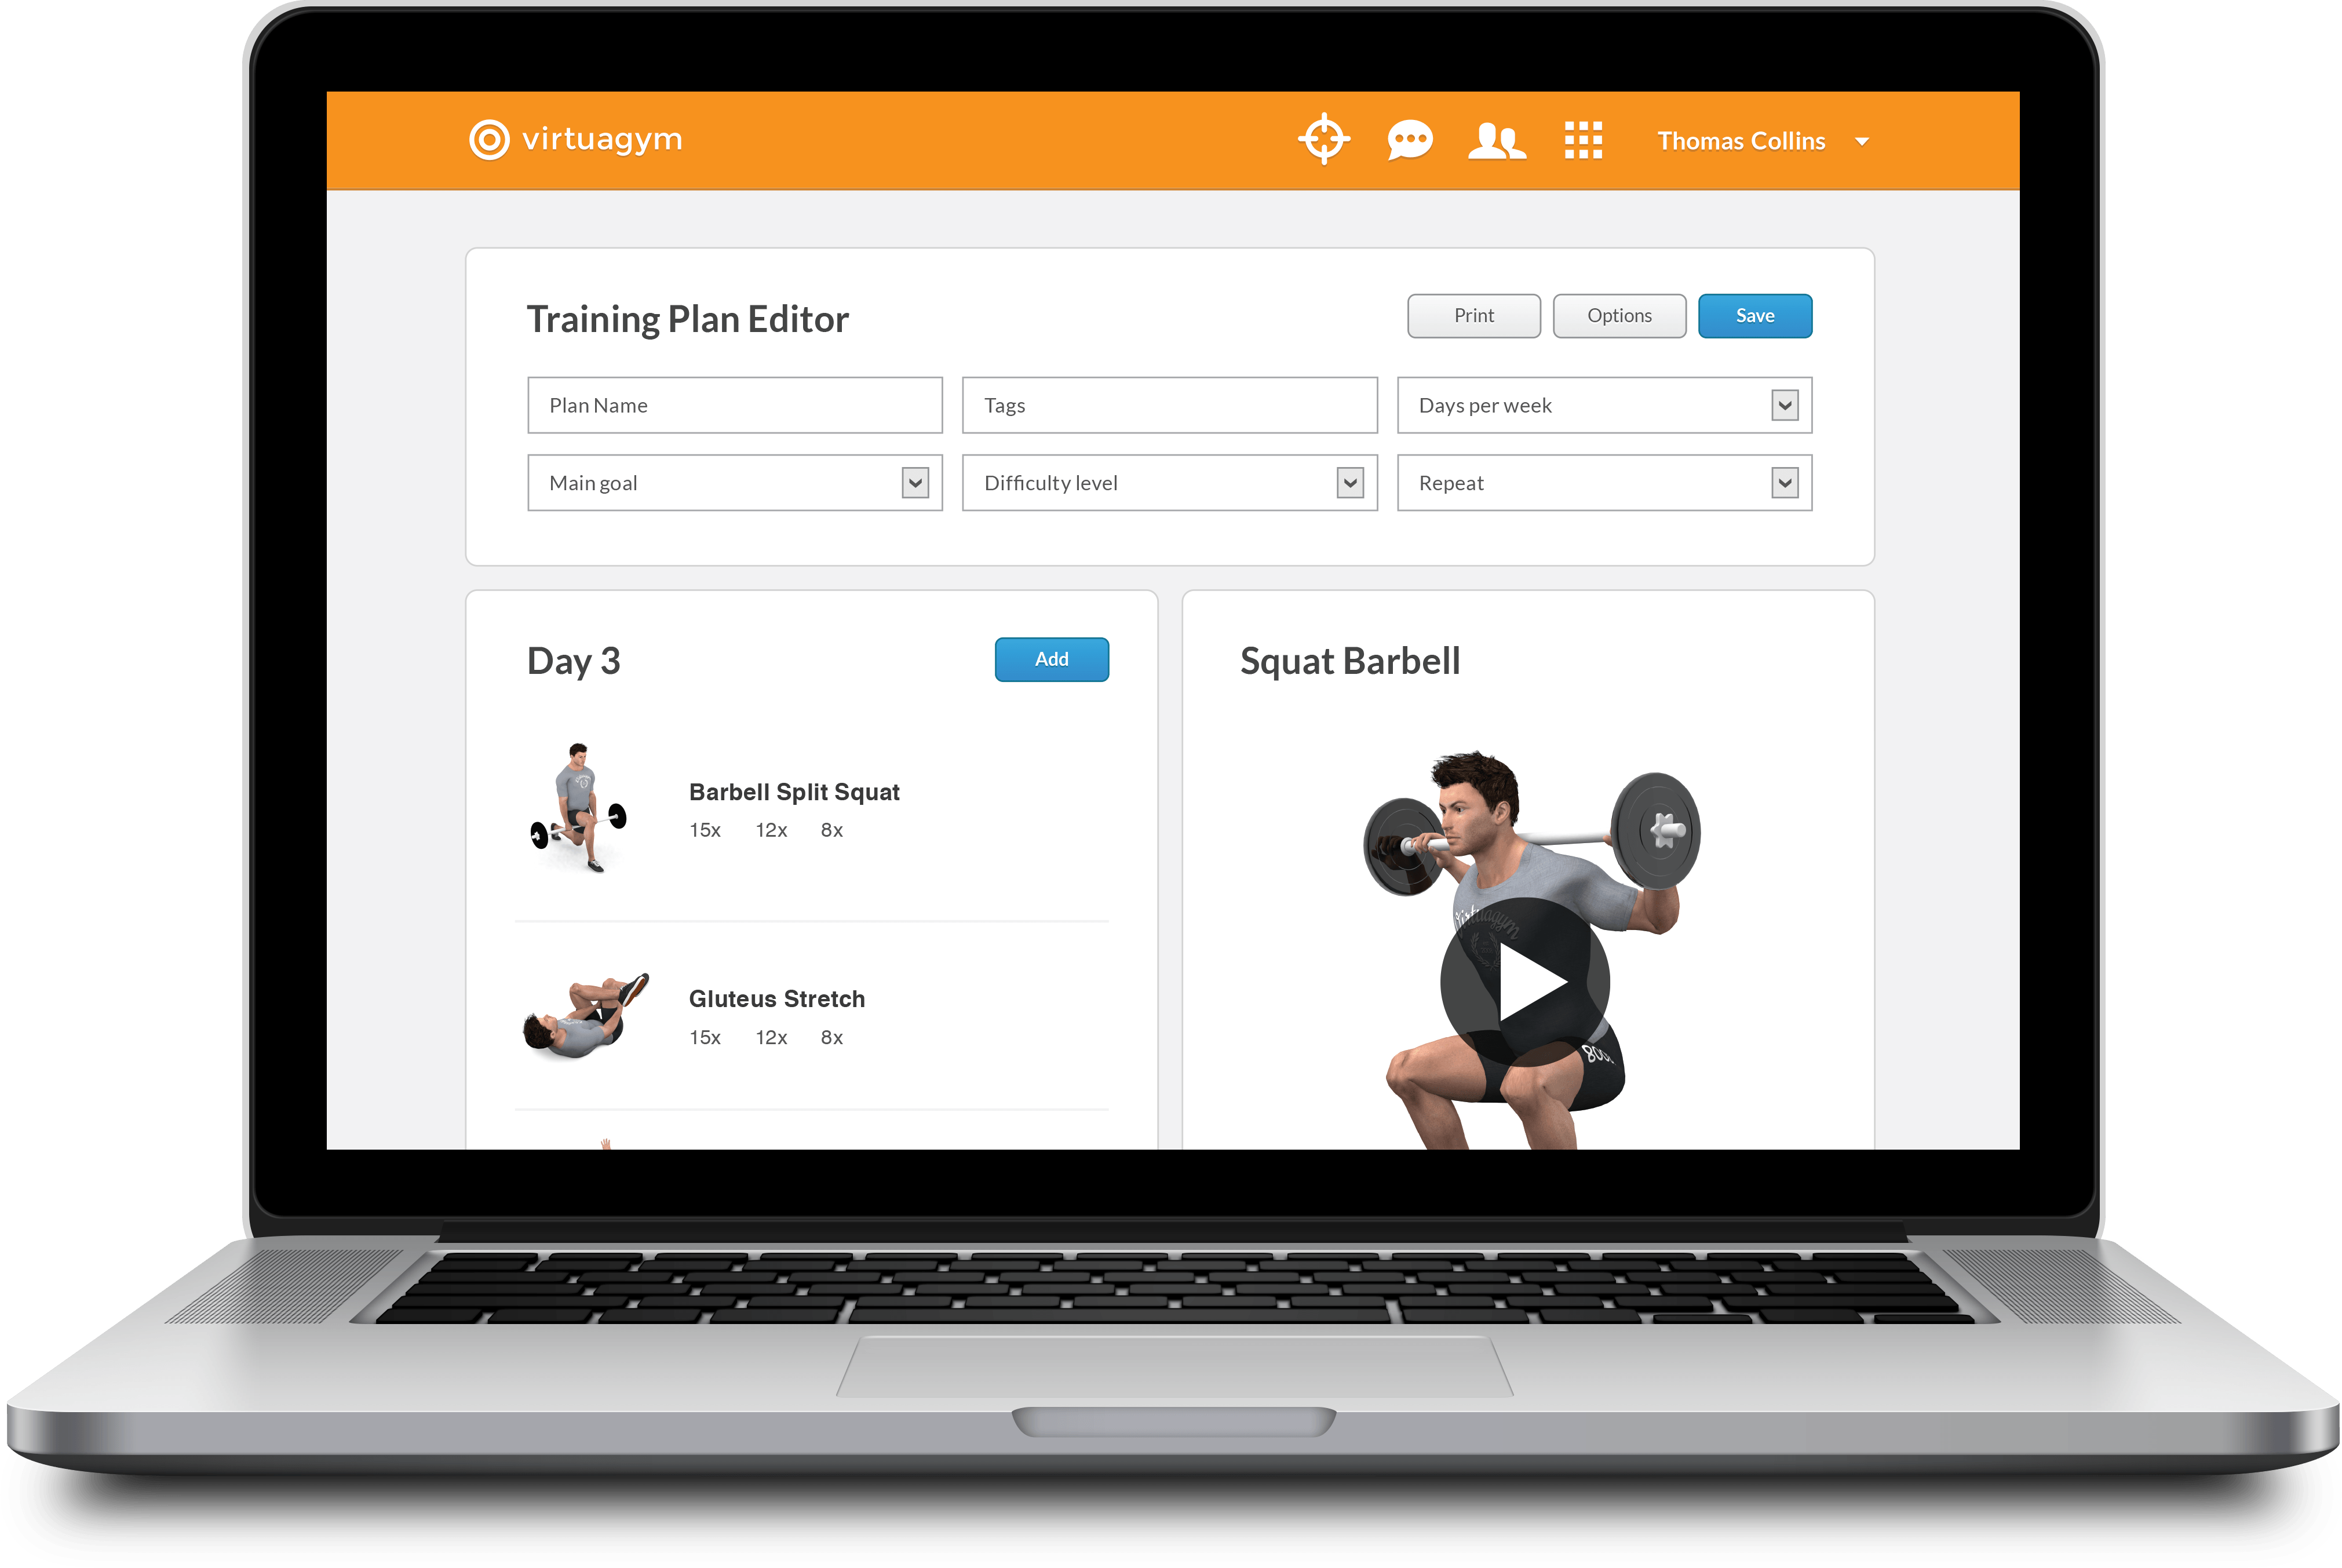 Macbook Pro Open Training Plan Editor